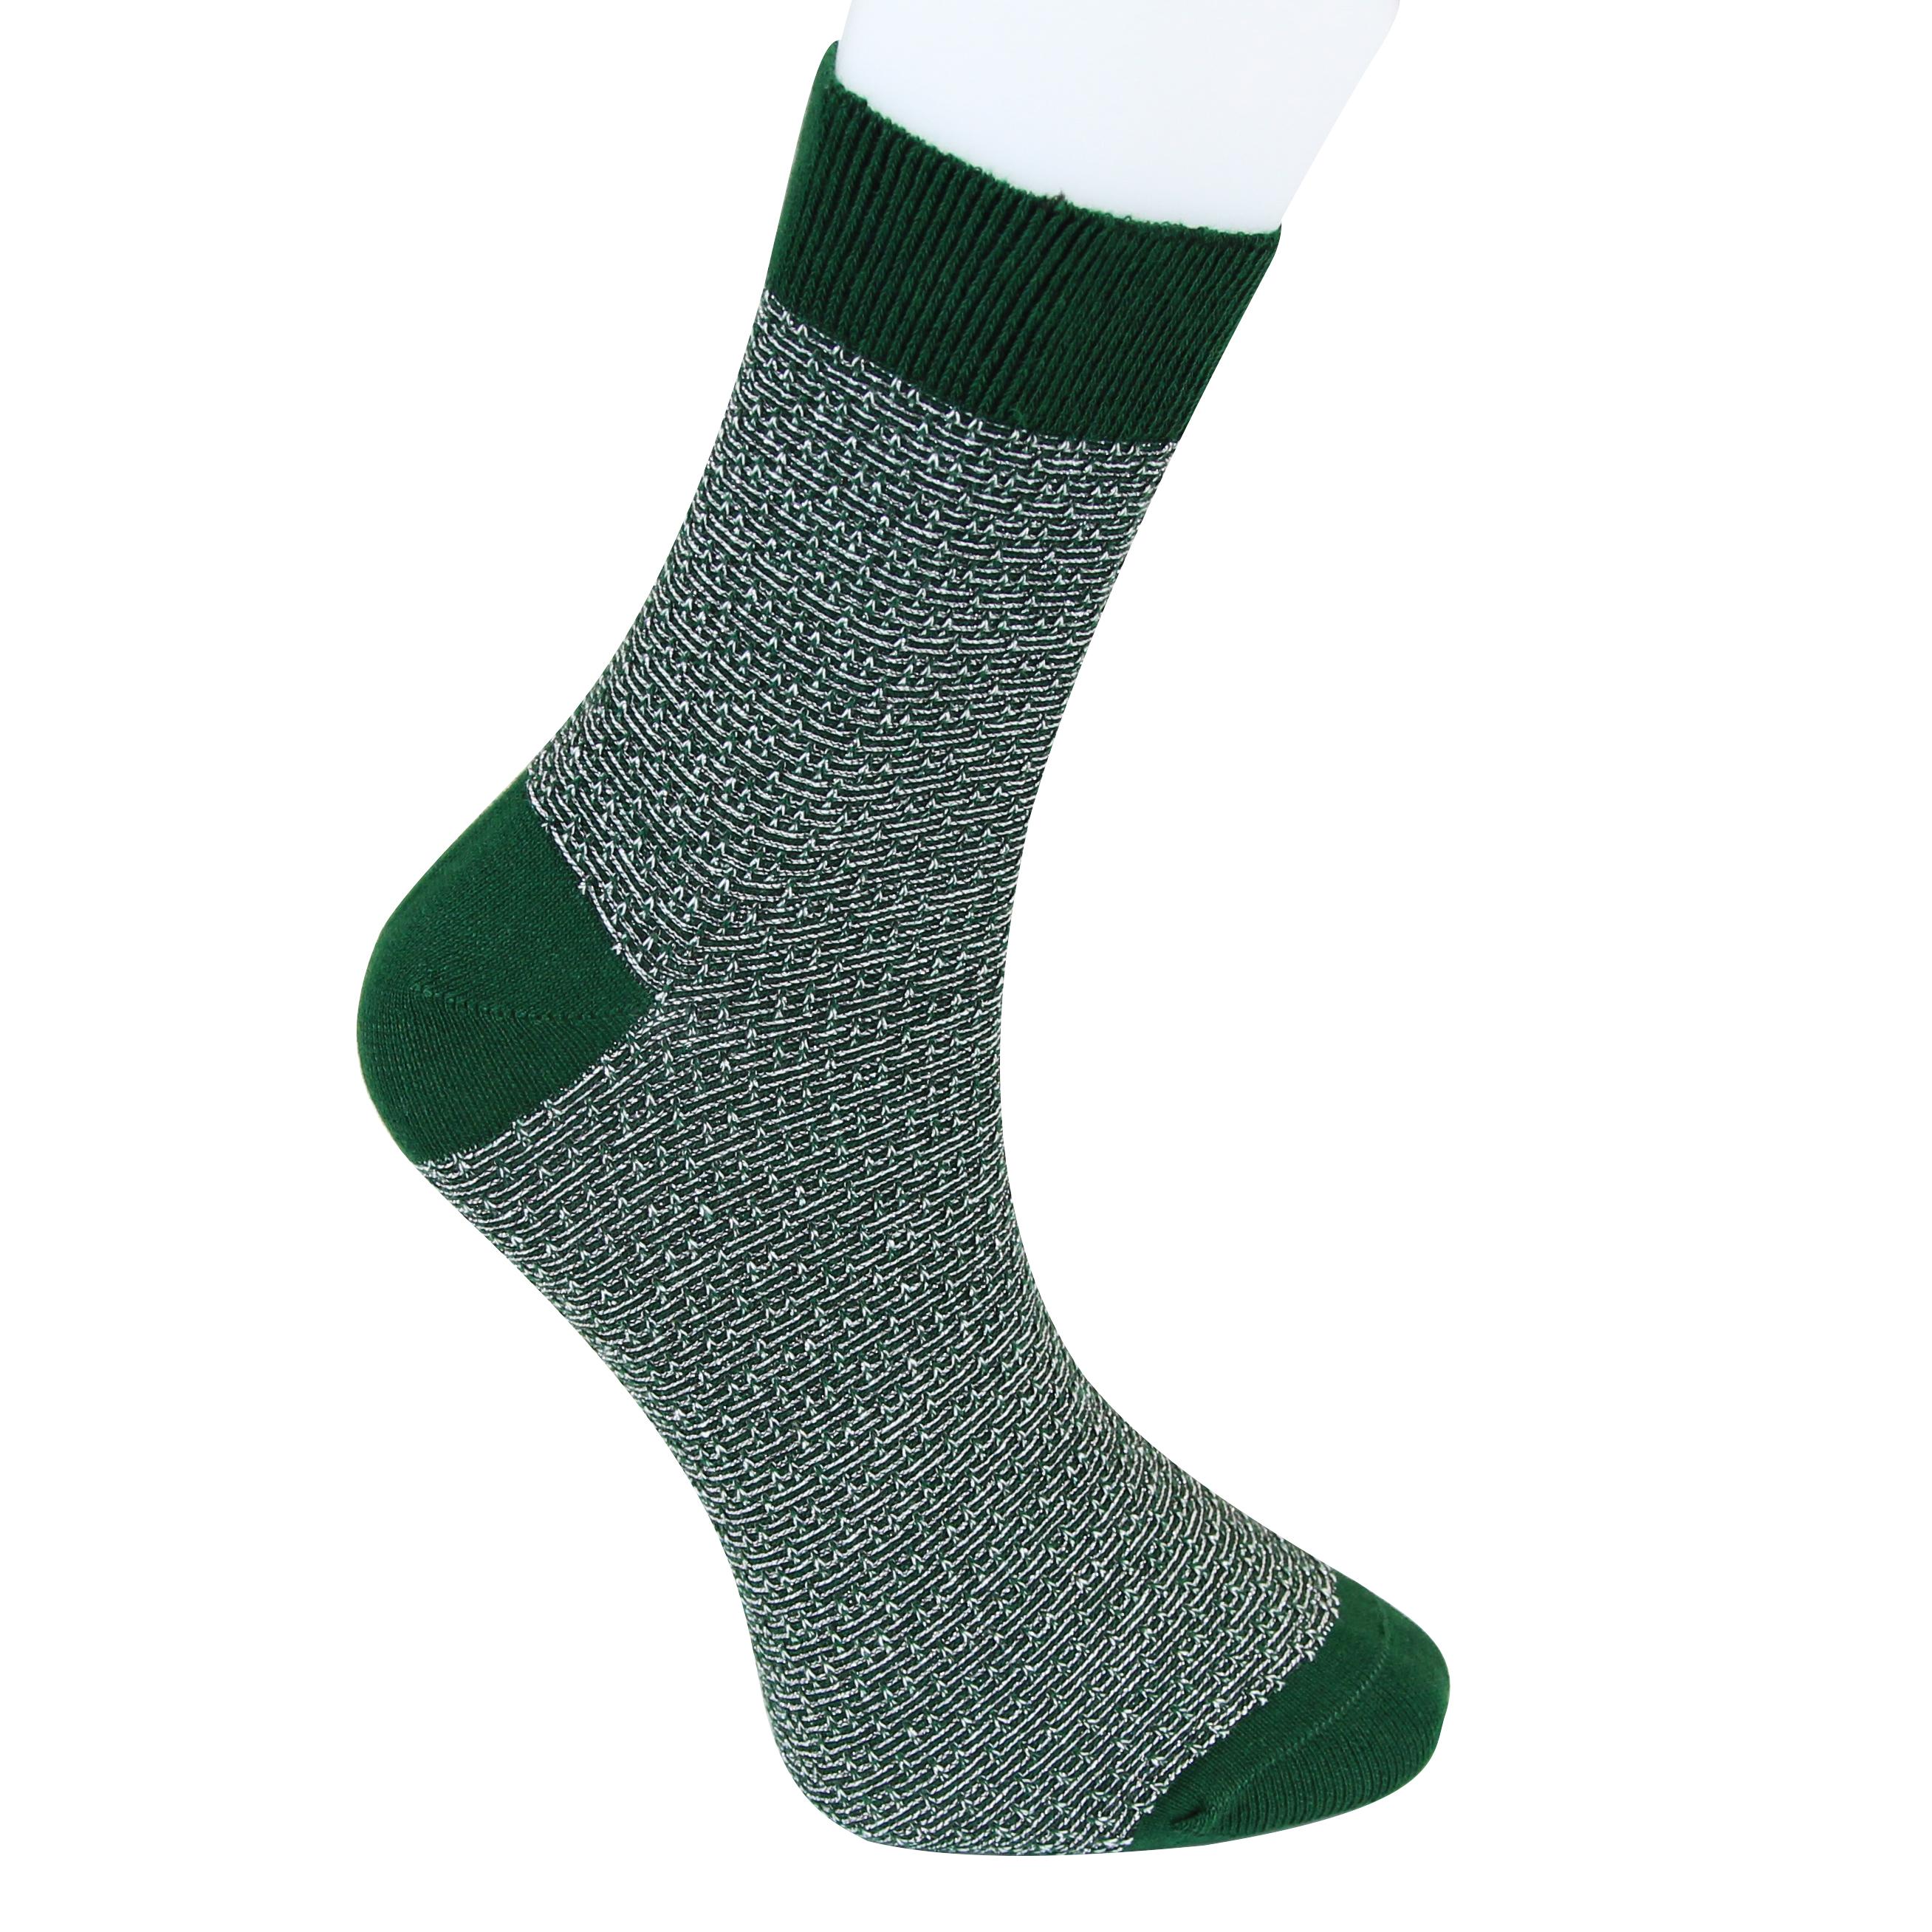 Daily Socks